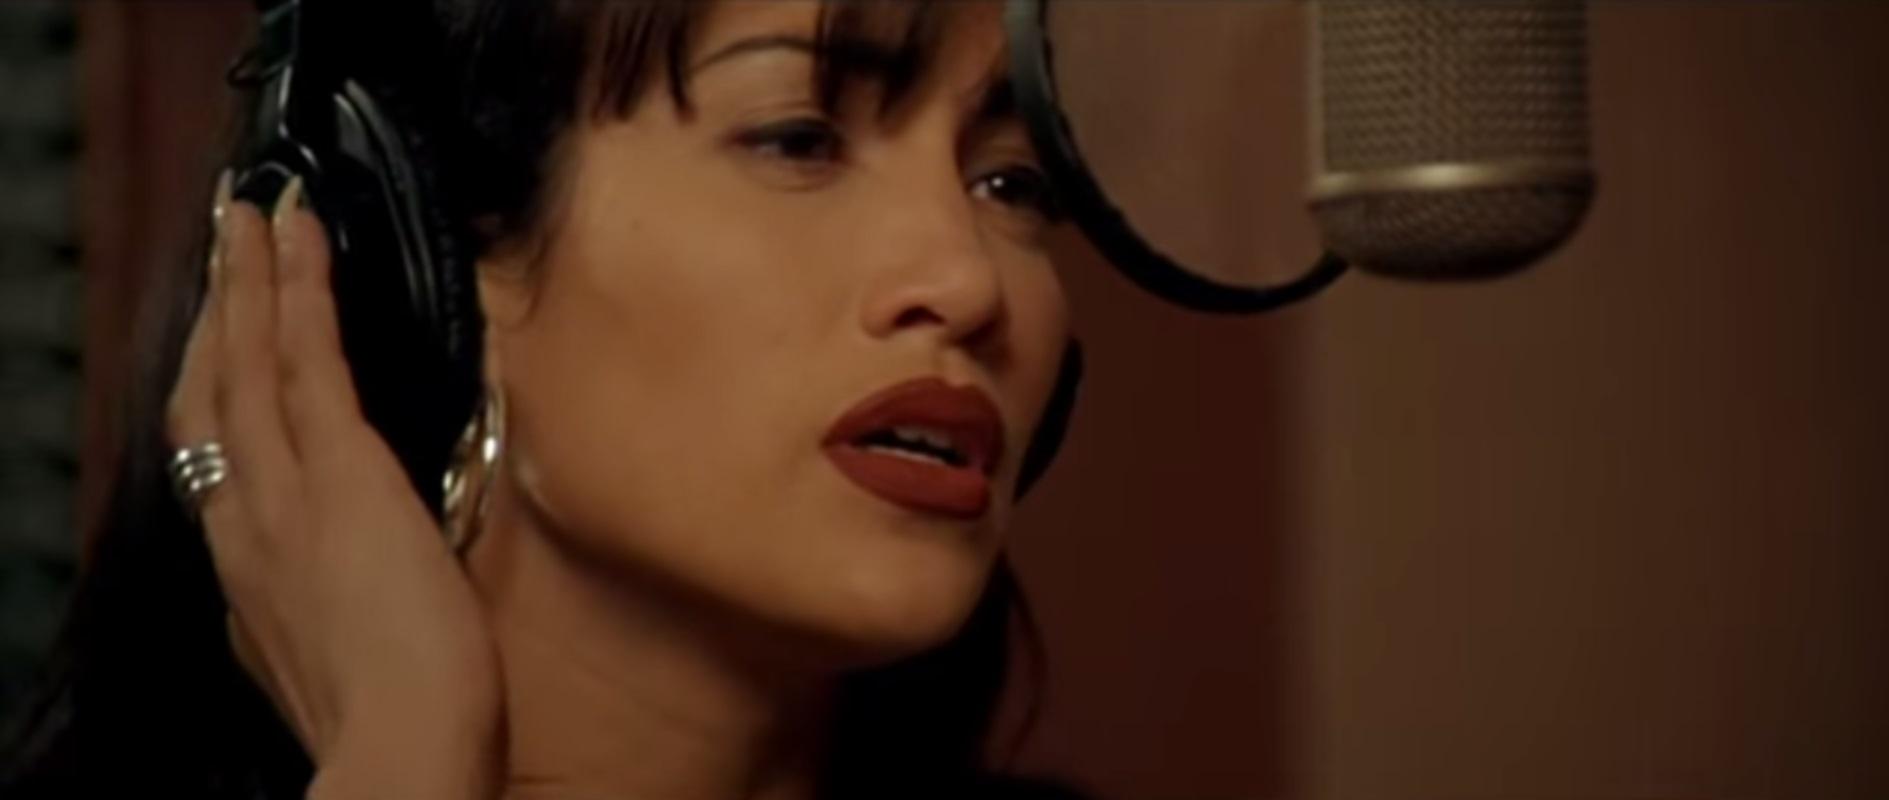 Selena movie pics